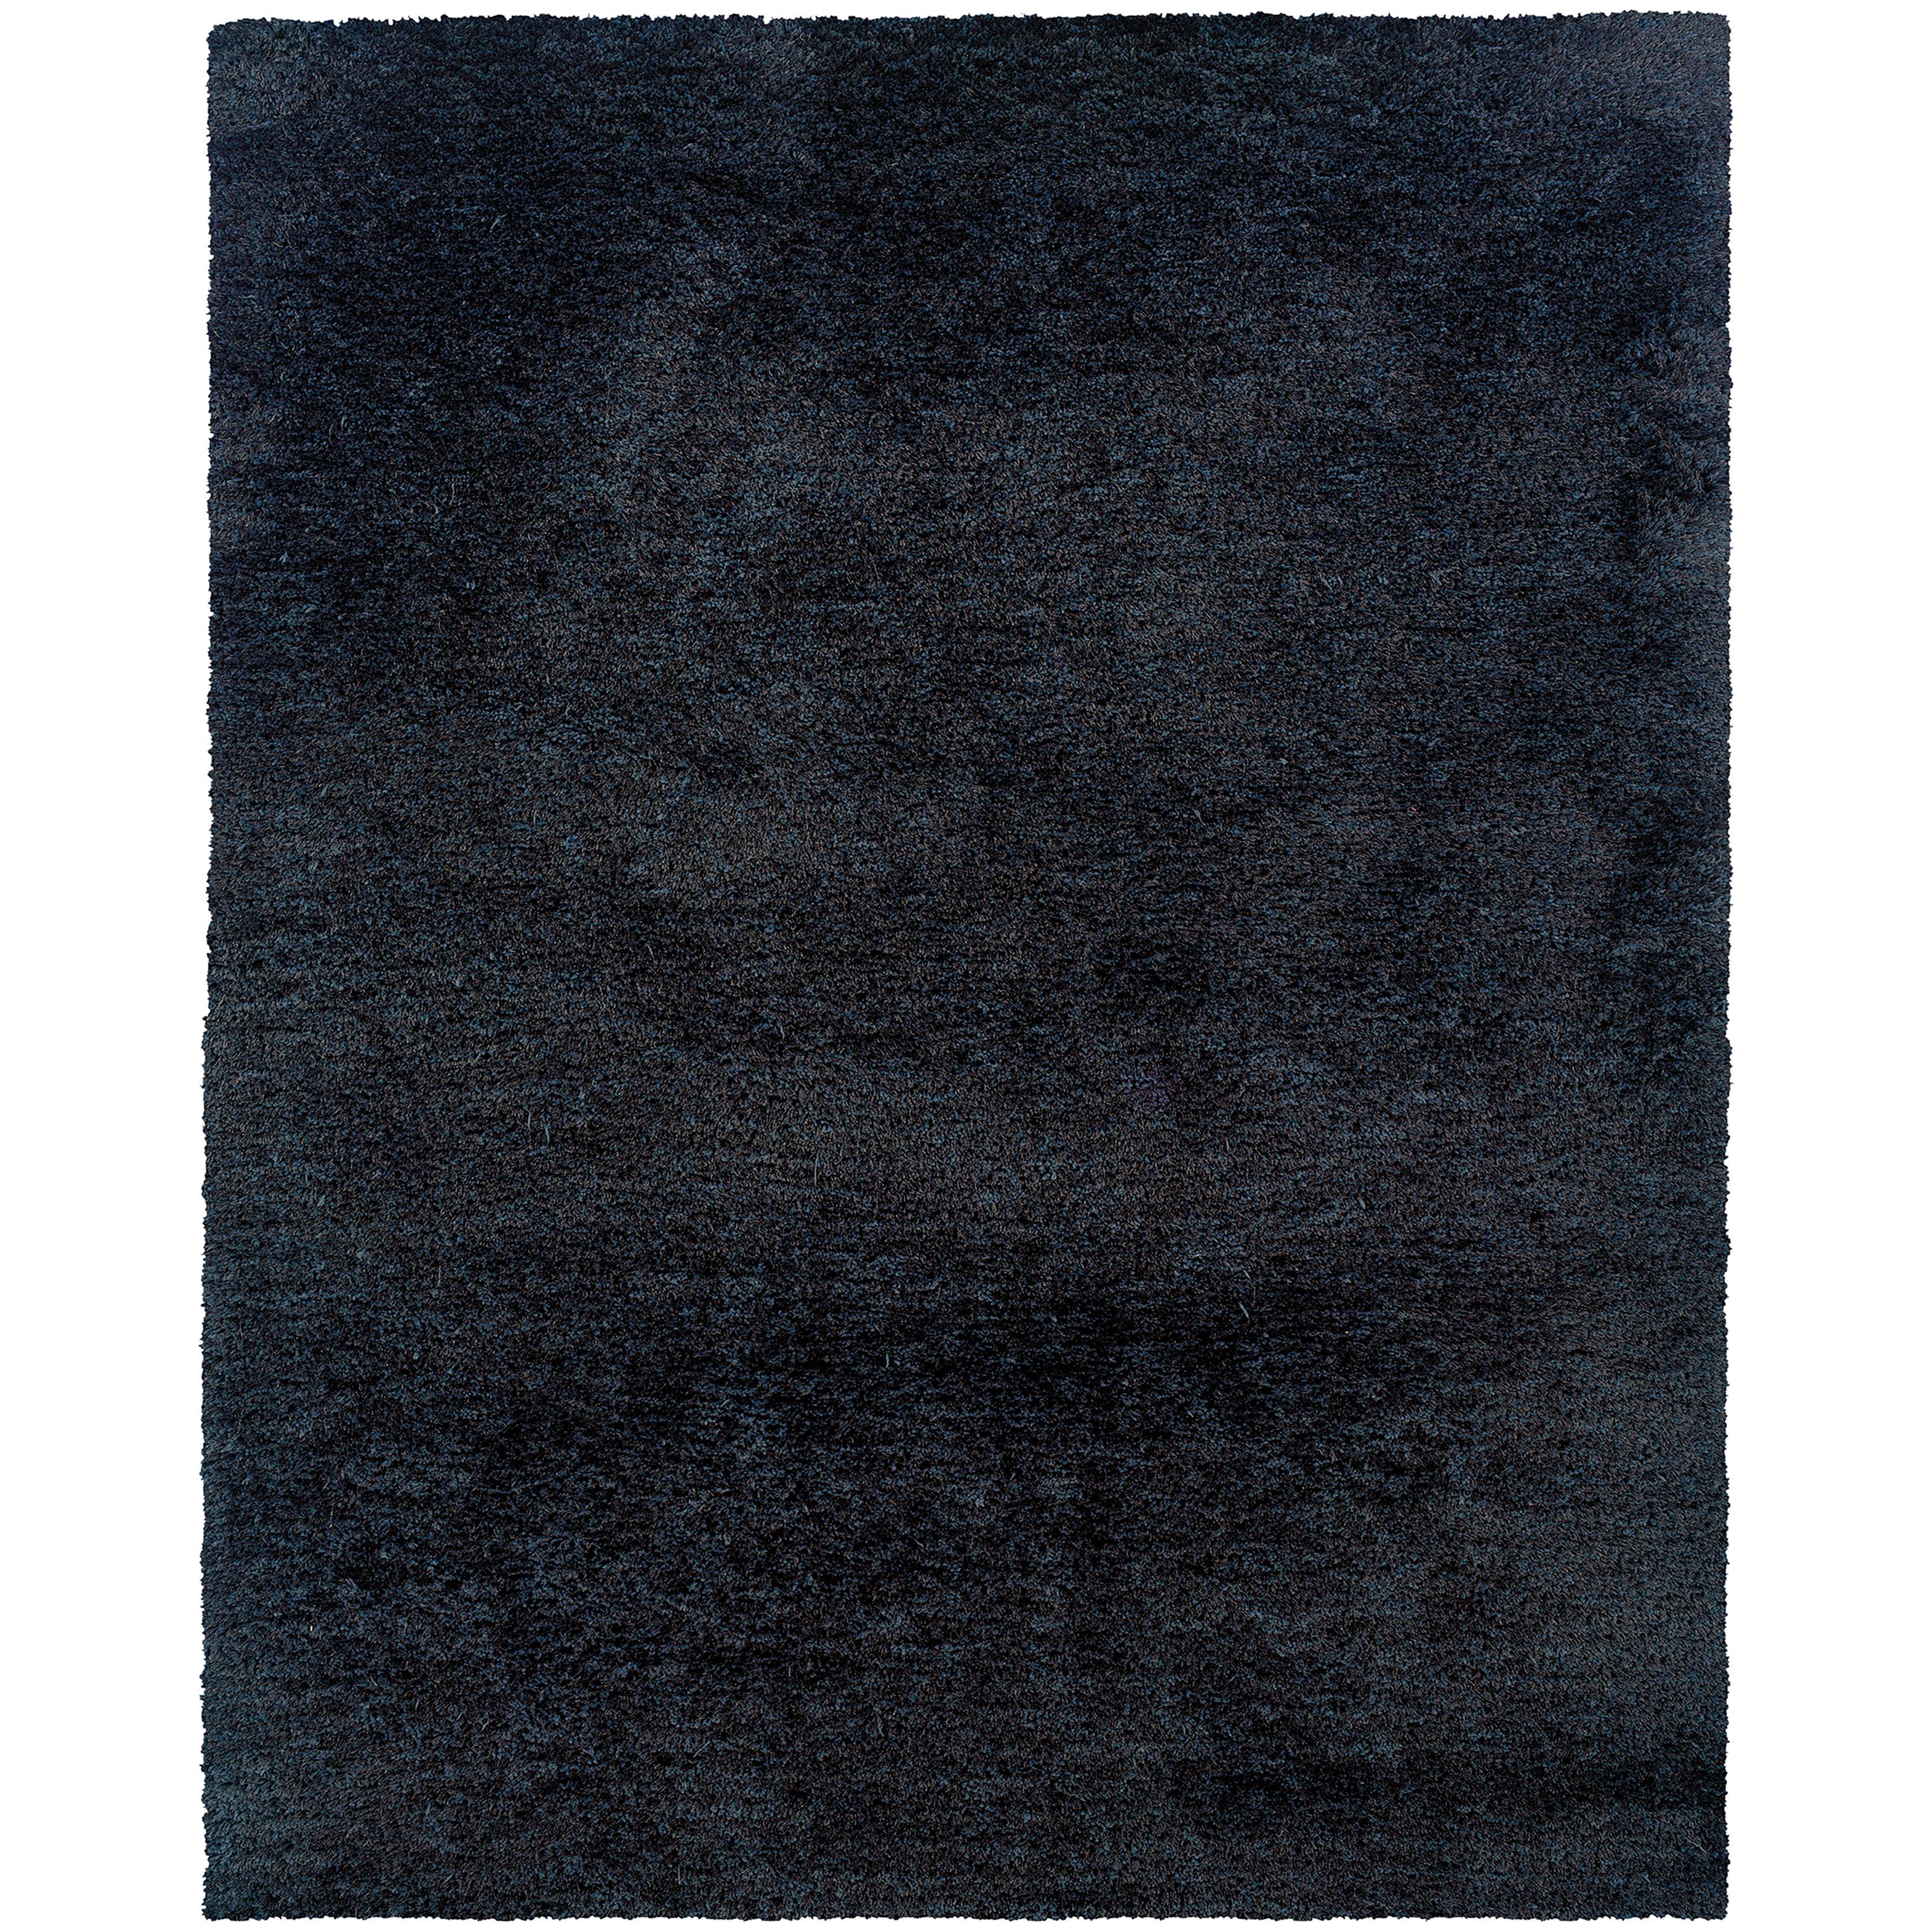 "Oriental Weavers Cosmo 6' 6"" X  9' 6"" Rug - Item Number: C81102198289ST"